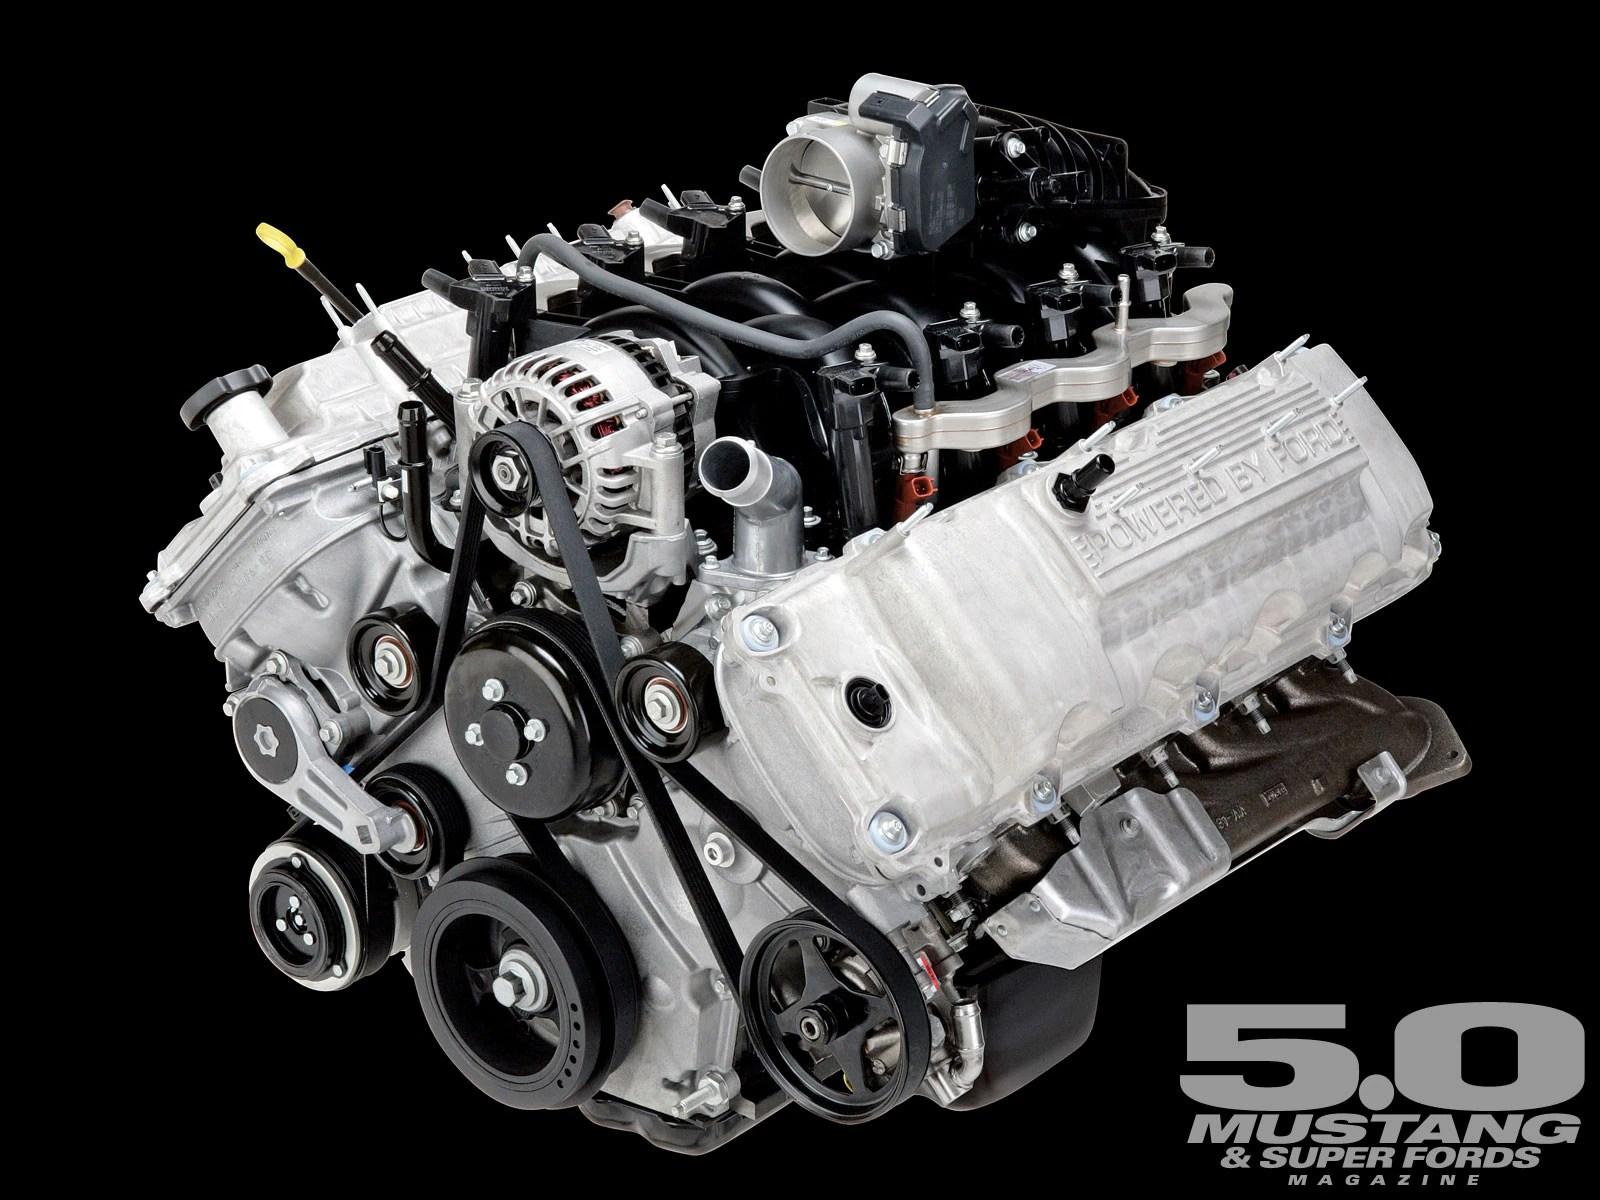 medium resolution of ford motor company 6 2 liter v8 engine big change